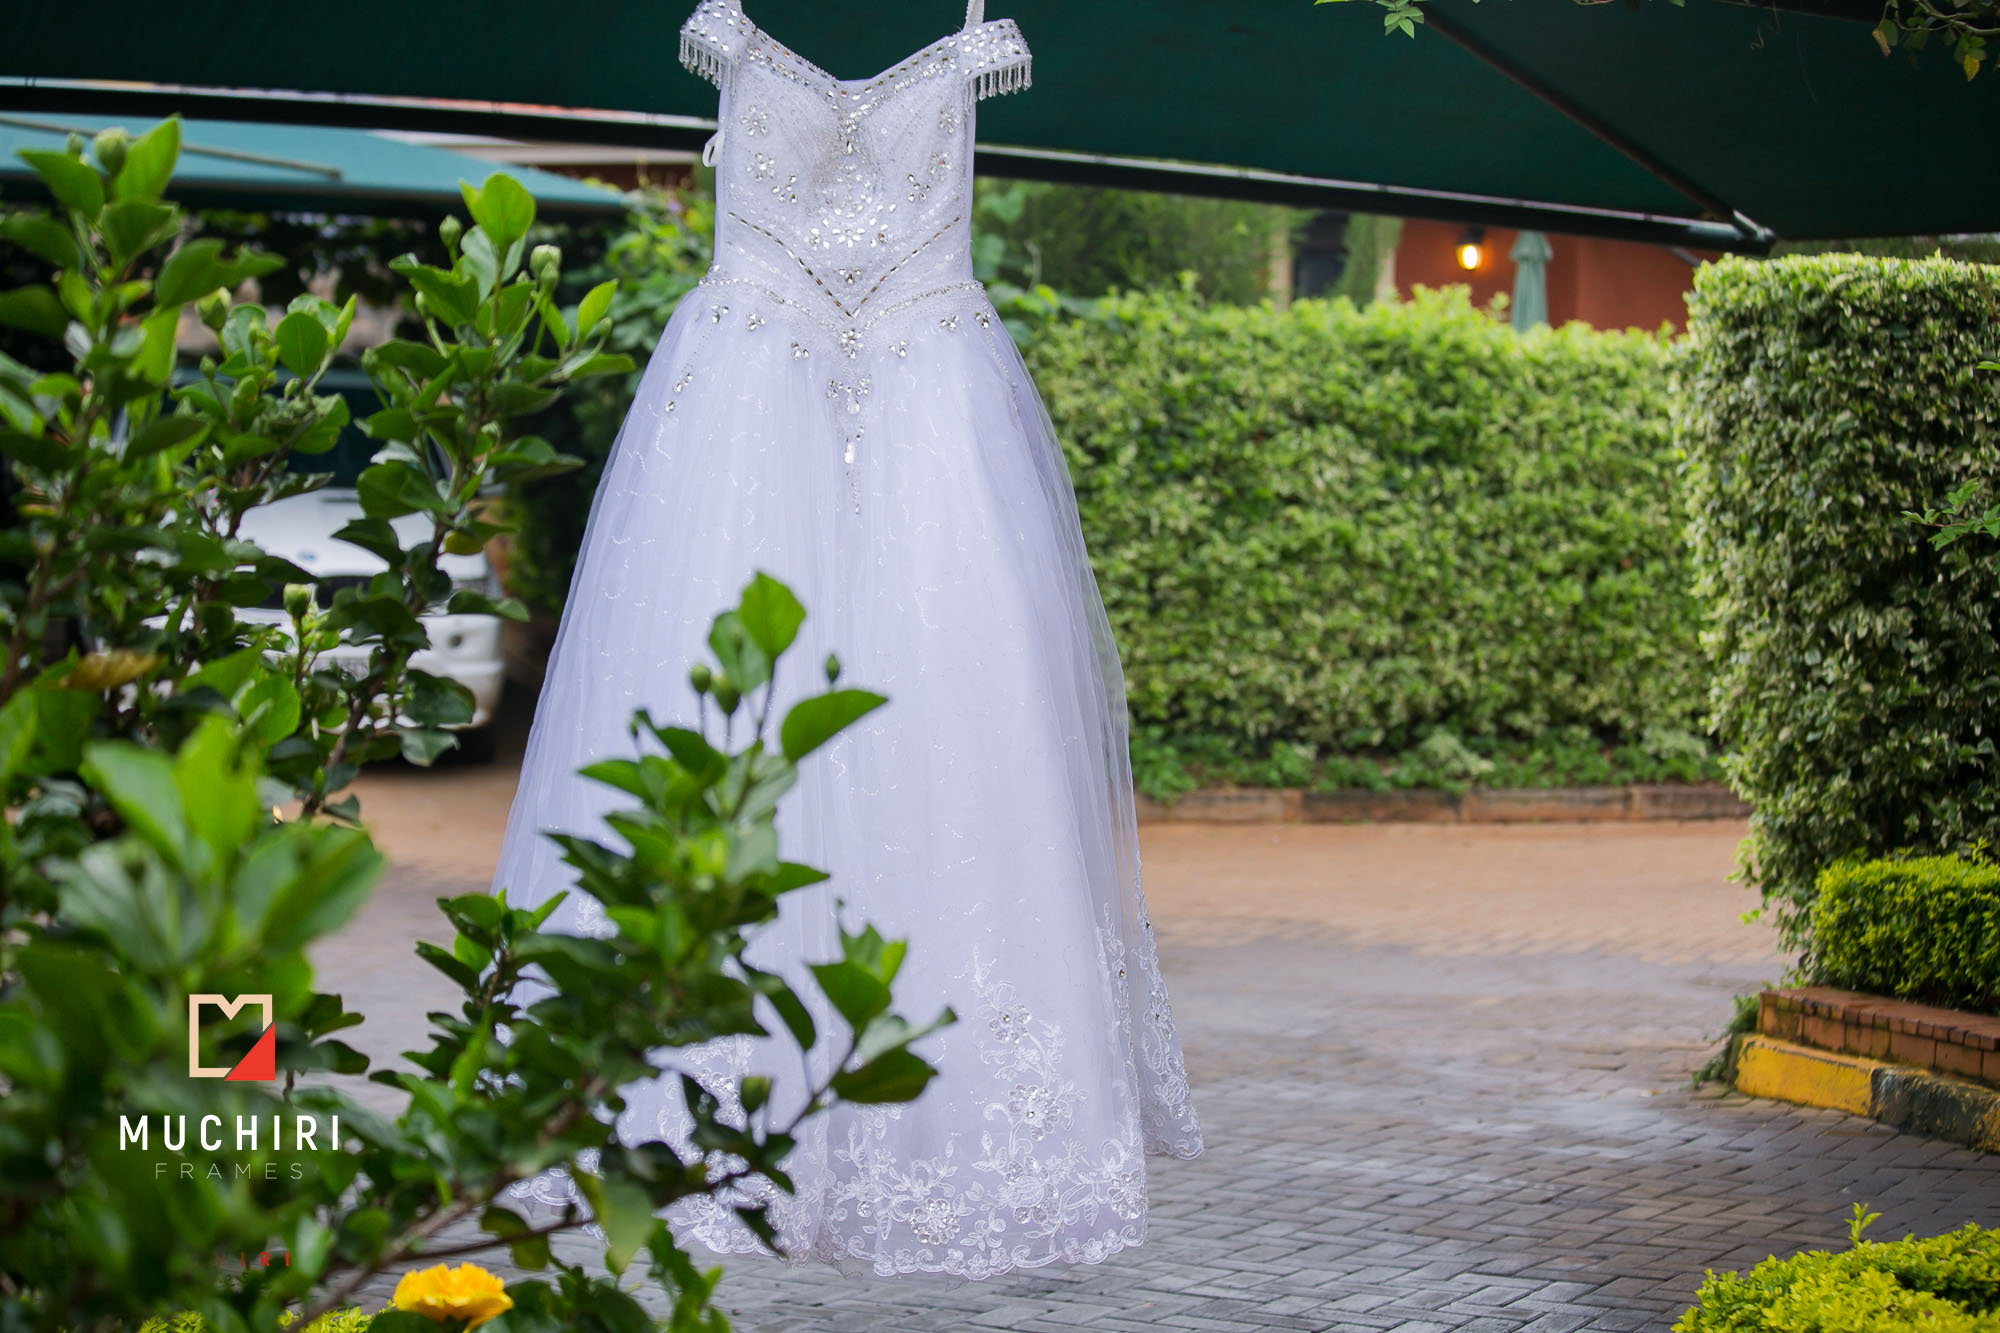 Best wedding photographers in kenya (3)